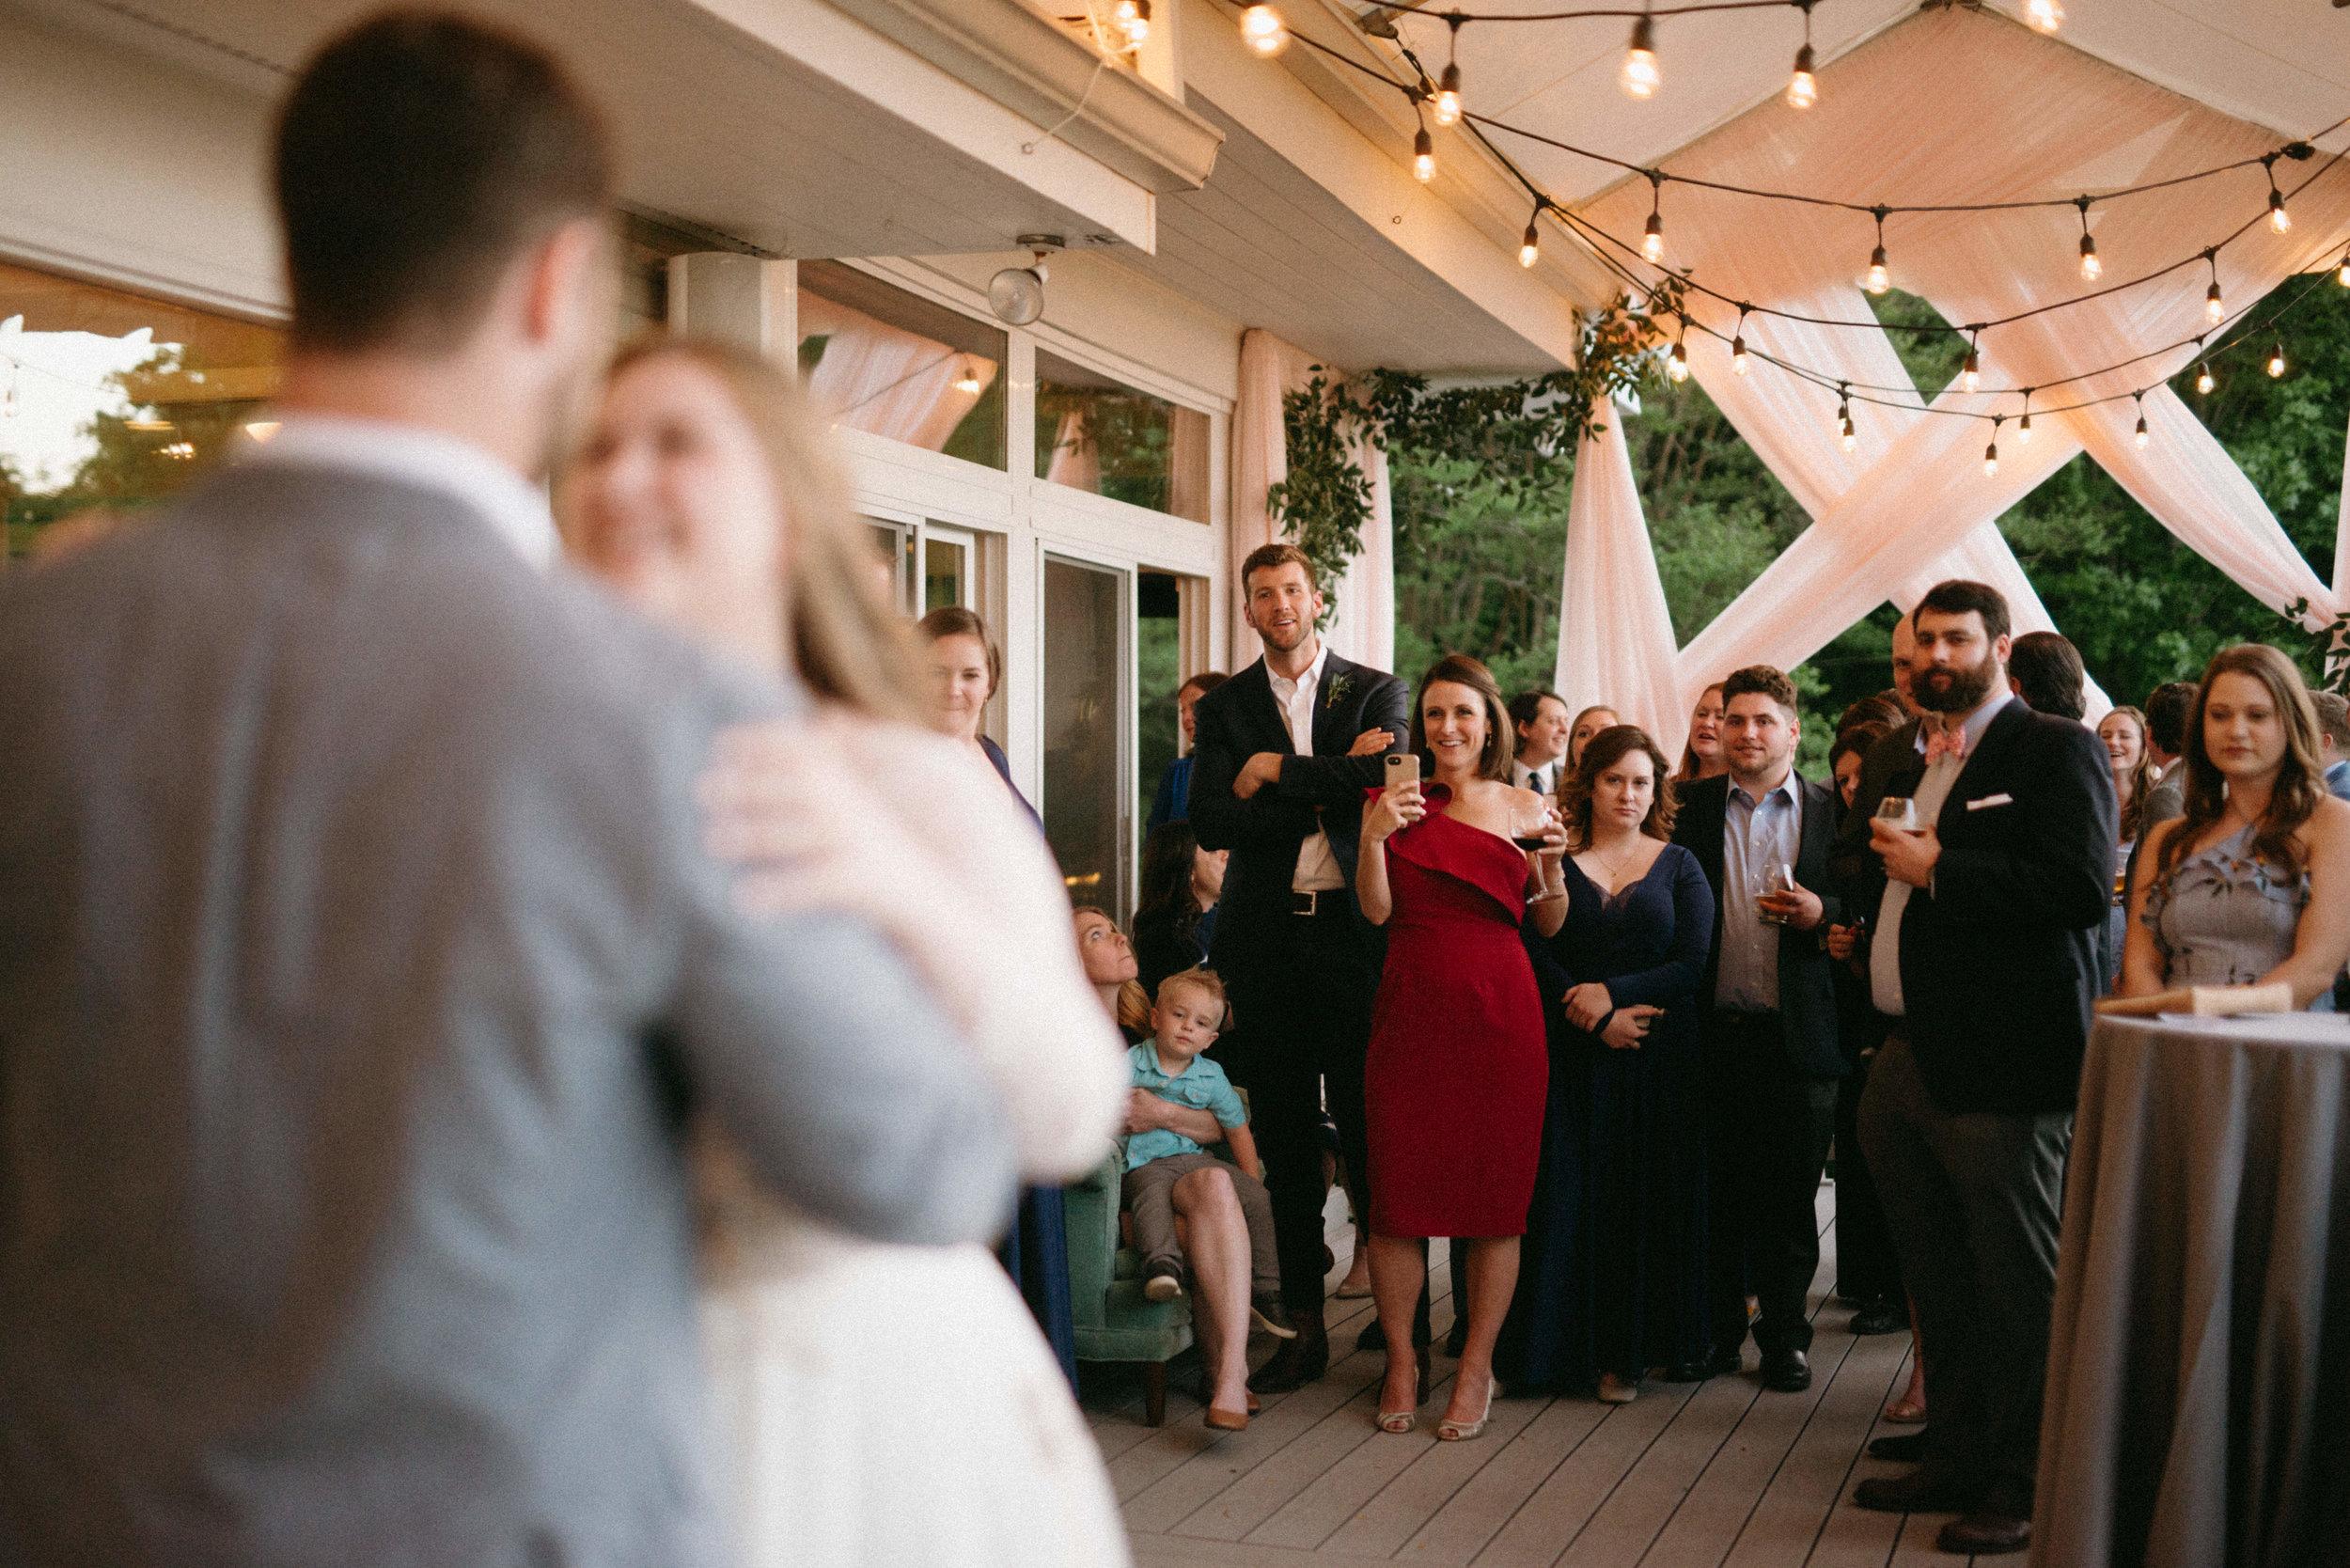 Elizabeth and Aldens Intimate Backyard wedding in Nashville Tennessee Wedding Photographer00037.jpg